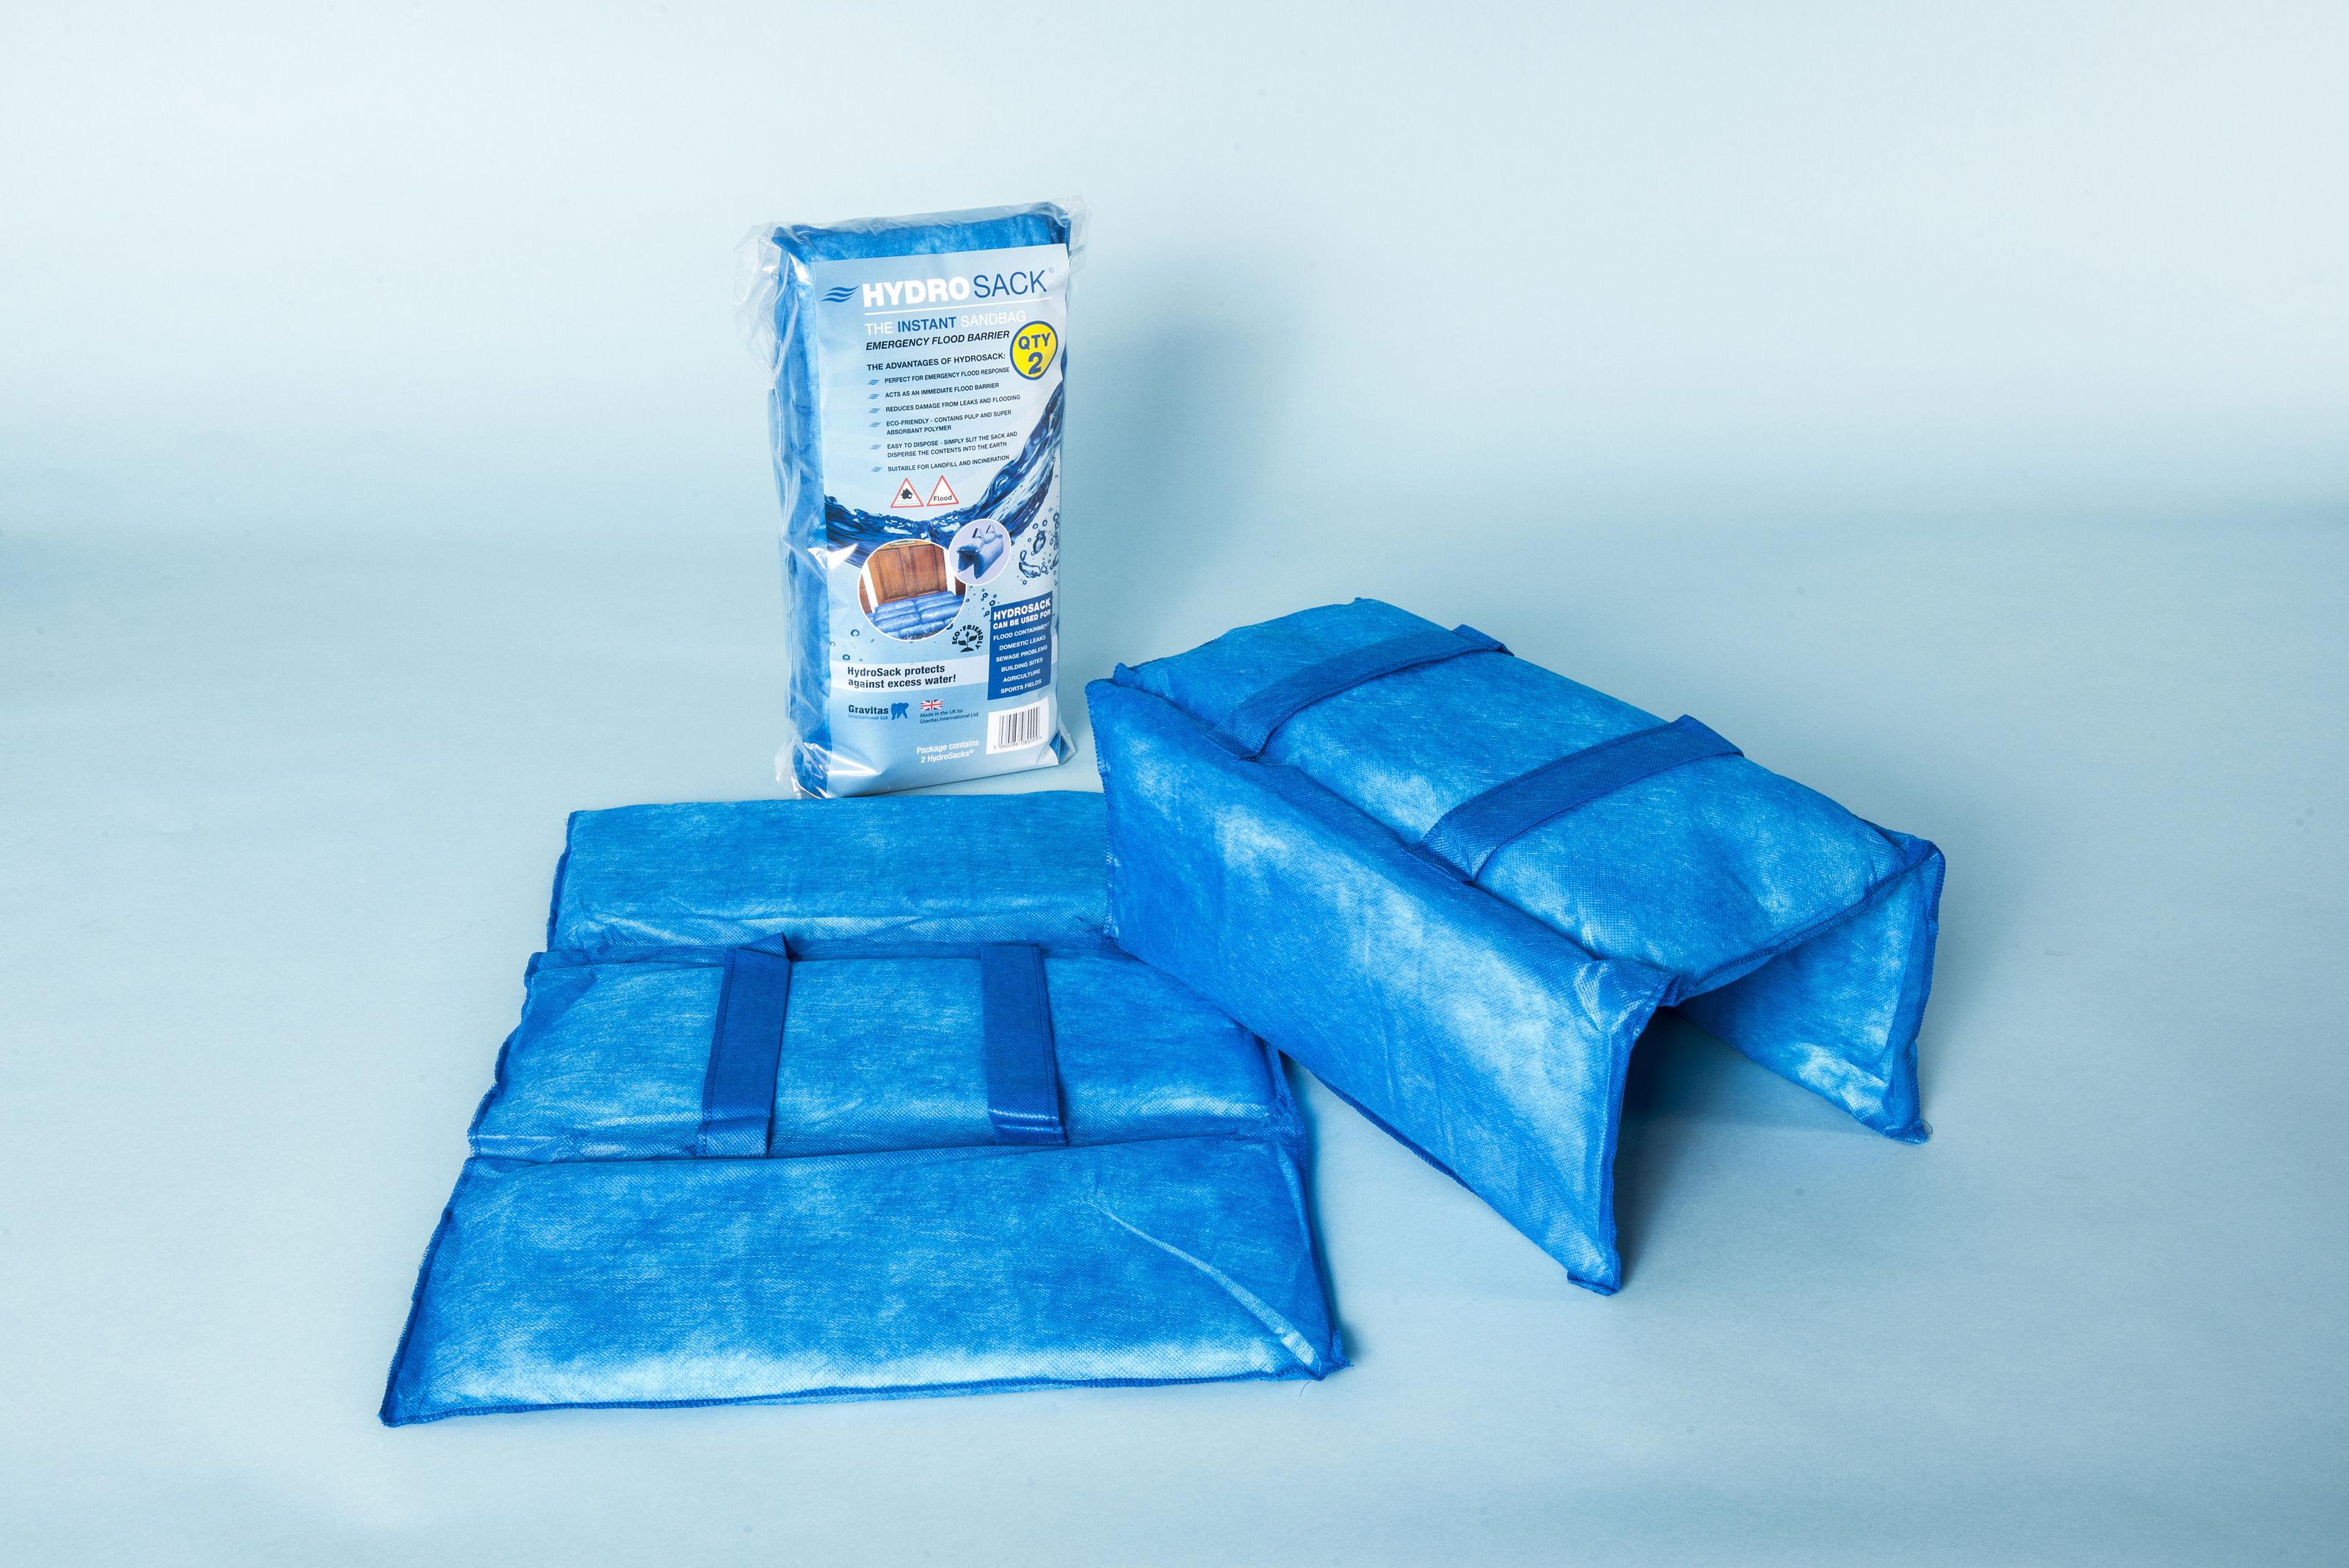 Hydrosack Flood Bags